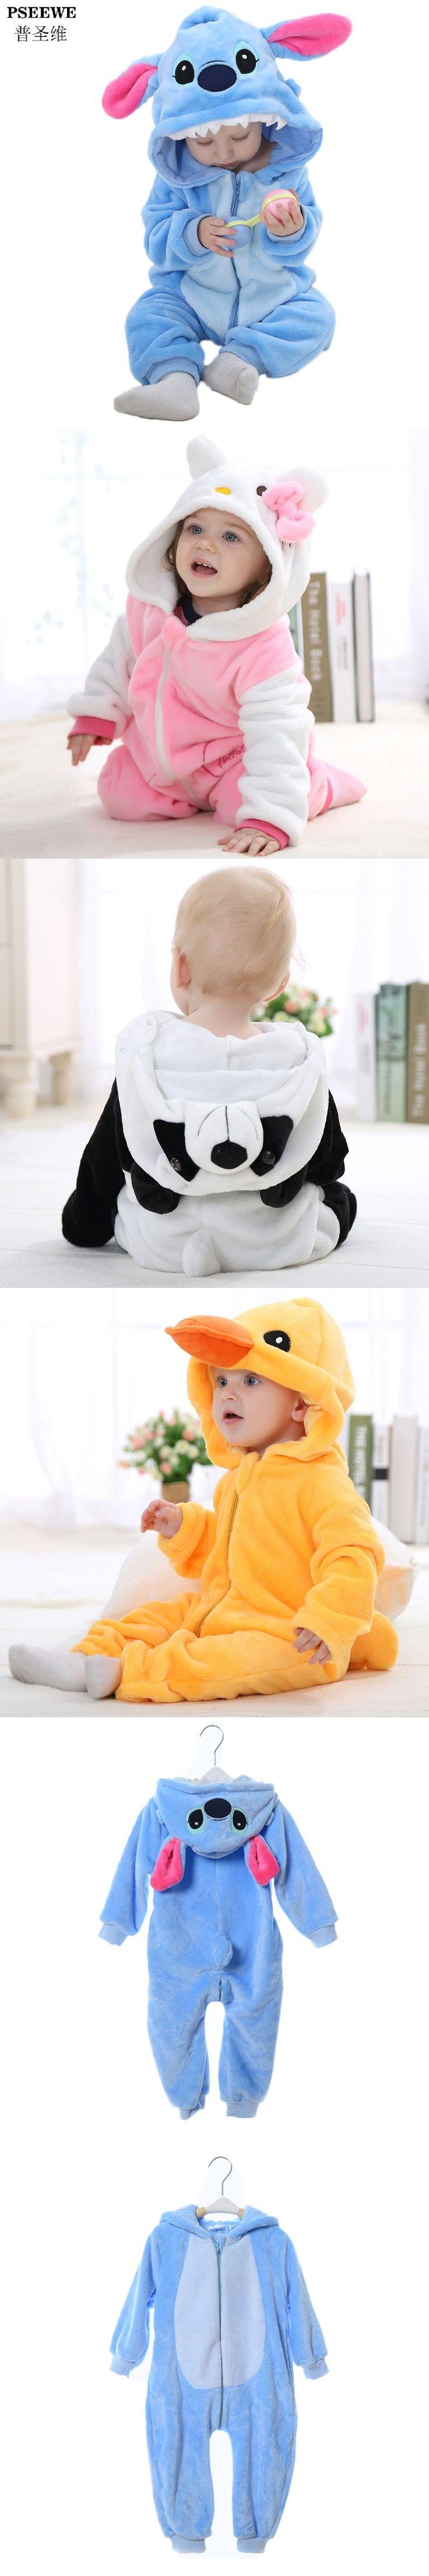 Best 20+ Stitch costume ideas on Pinterest | Lilo and stitch ...